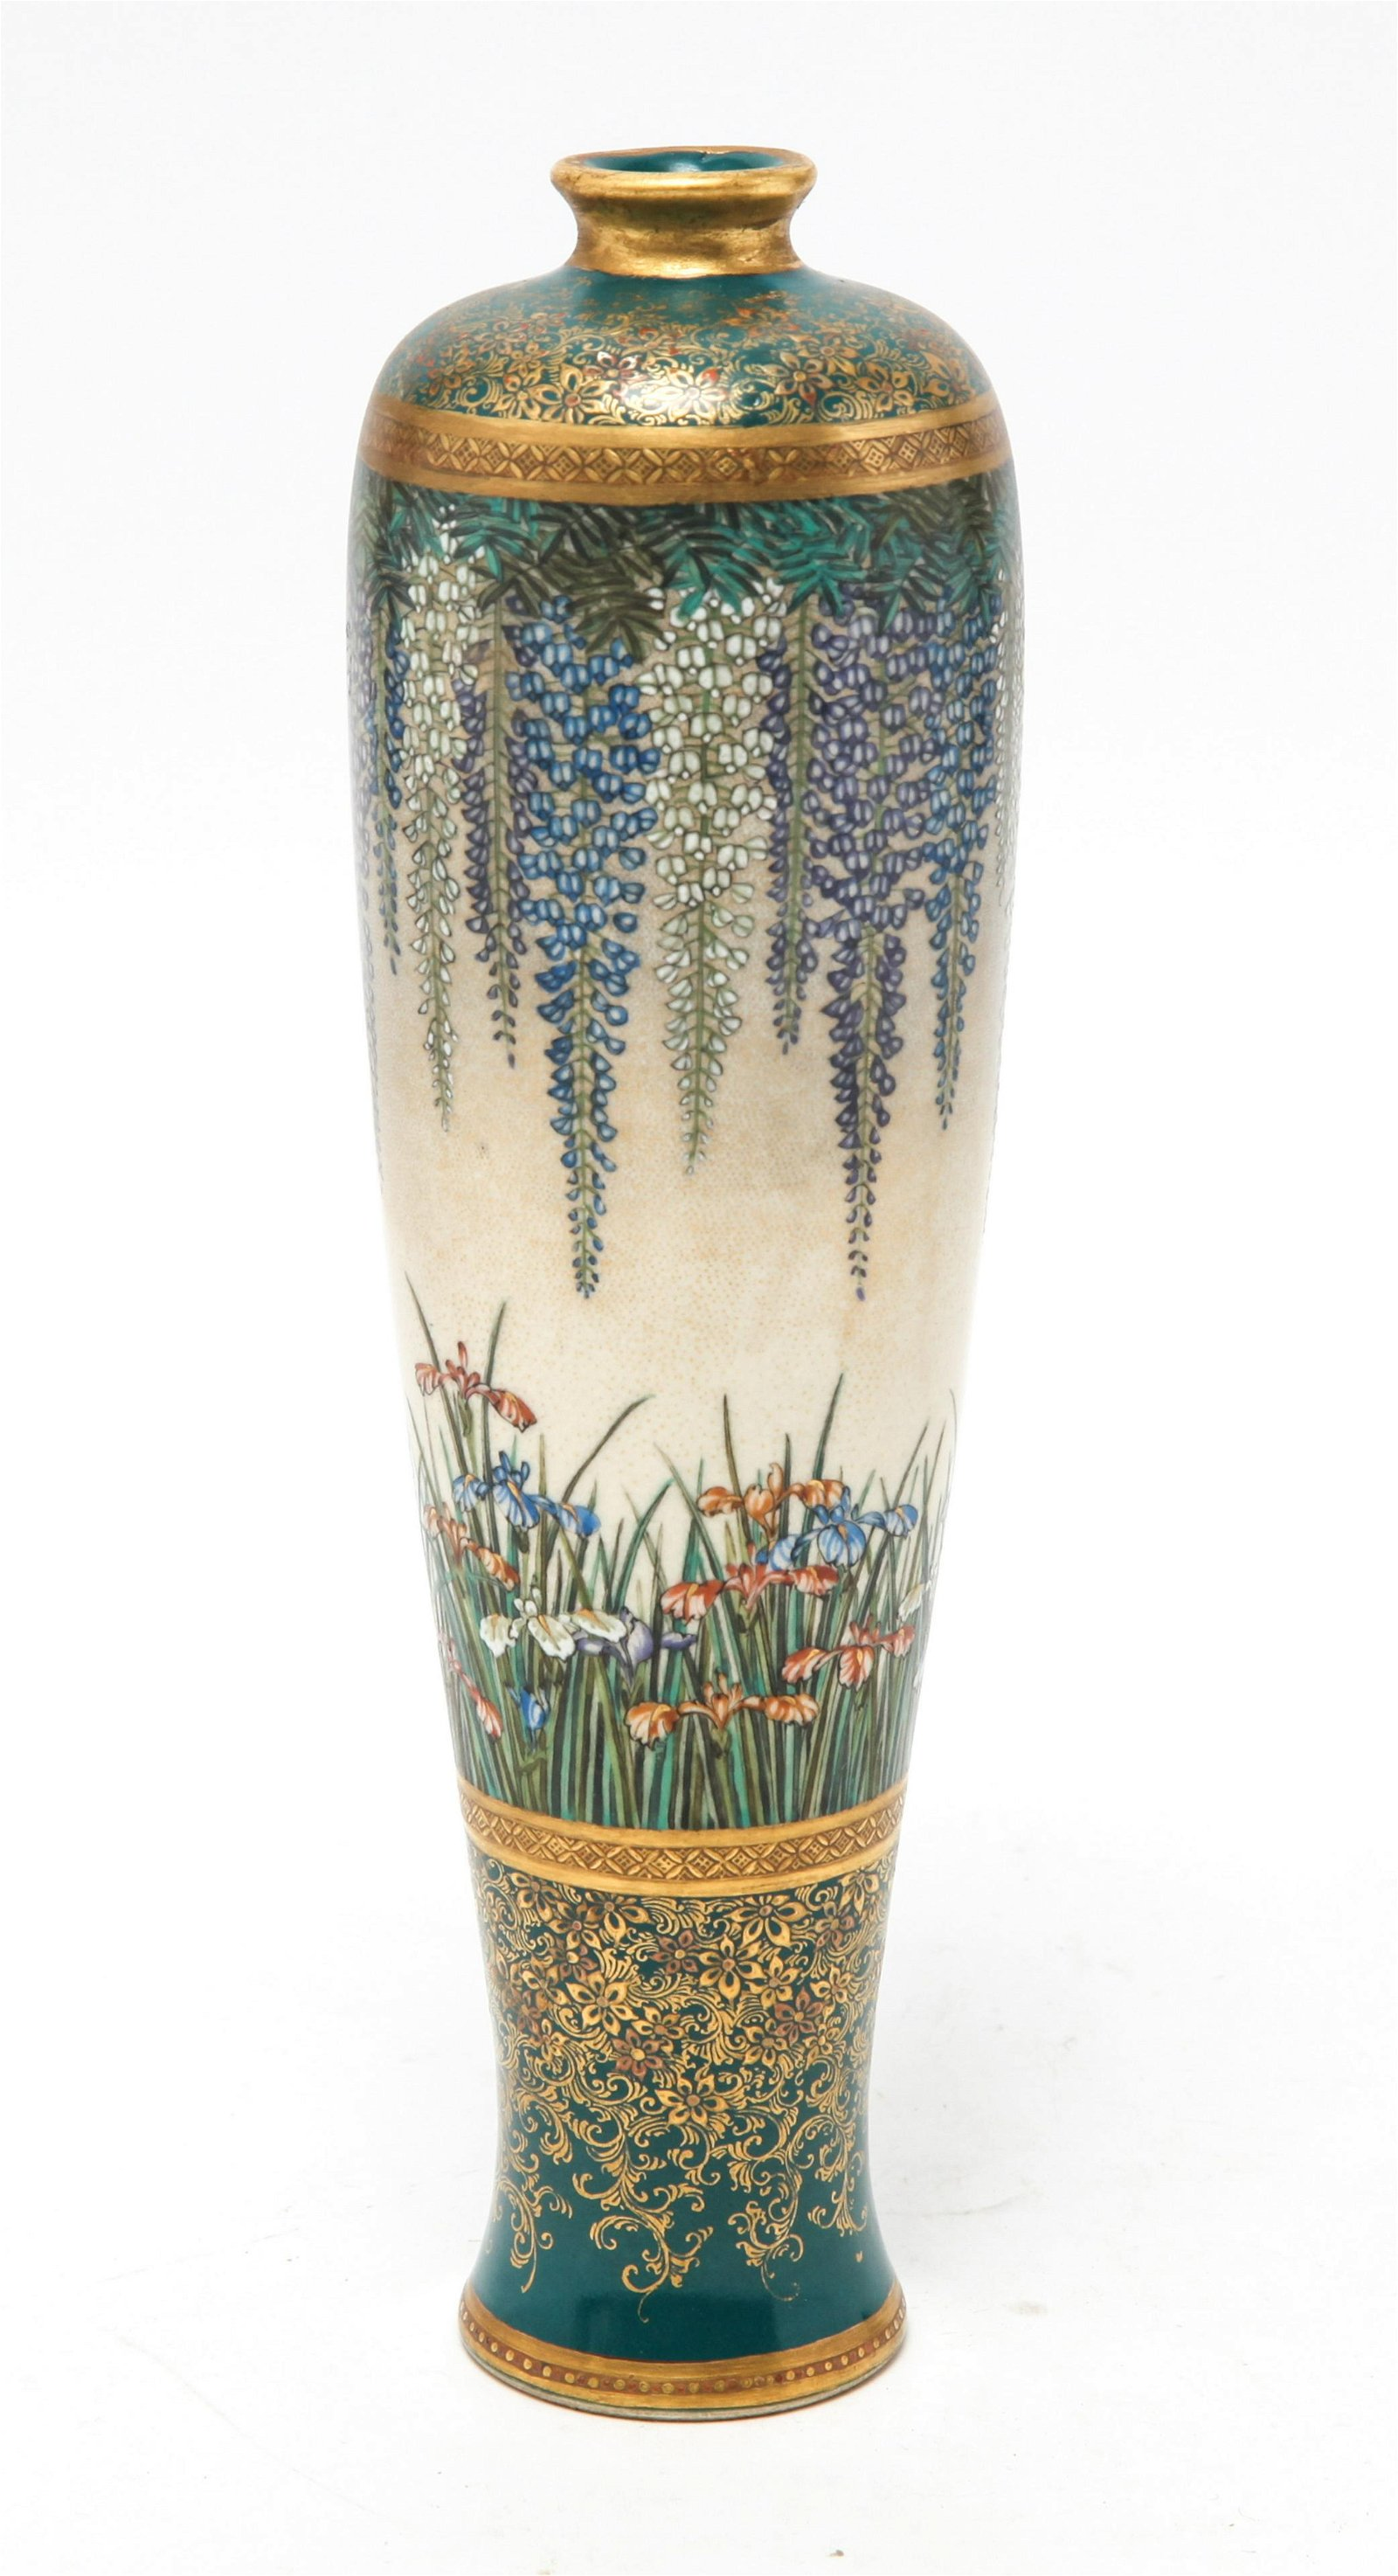 Japanese Satsuma Wisteria & Iris Hand-Painted Vase